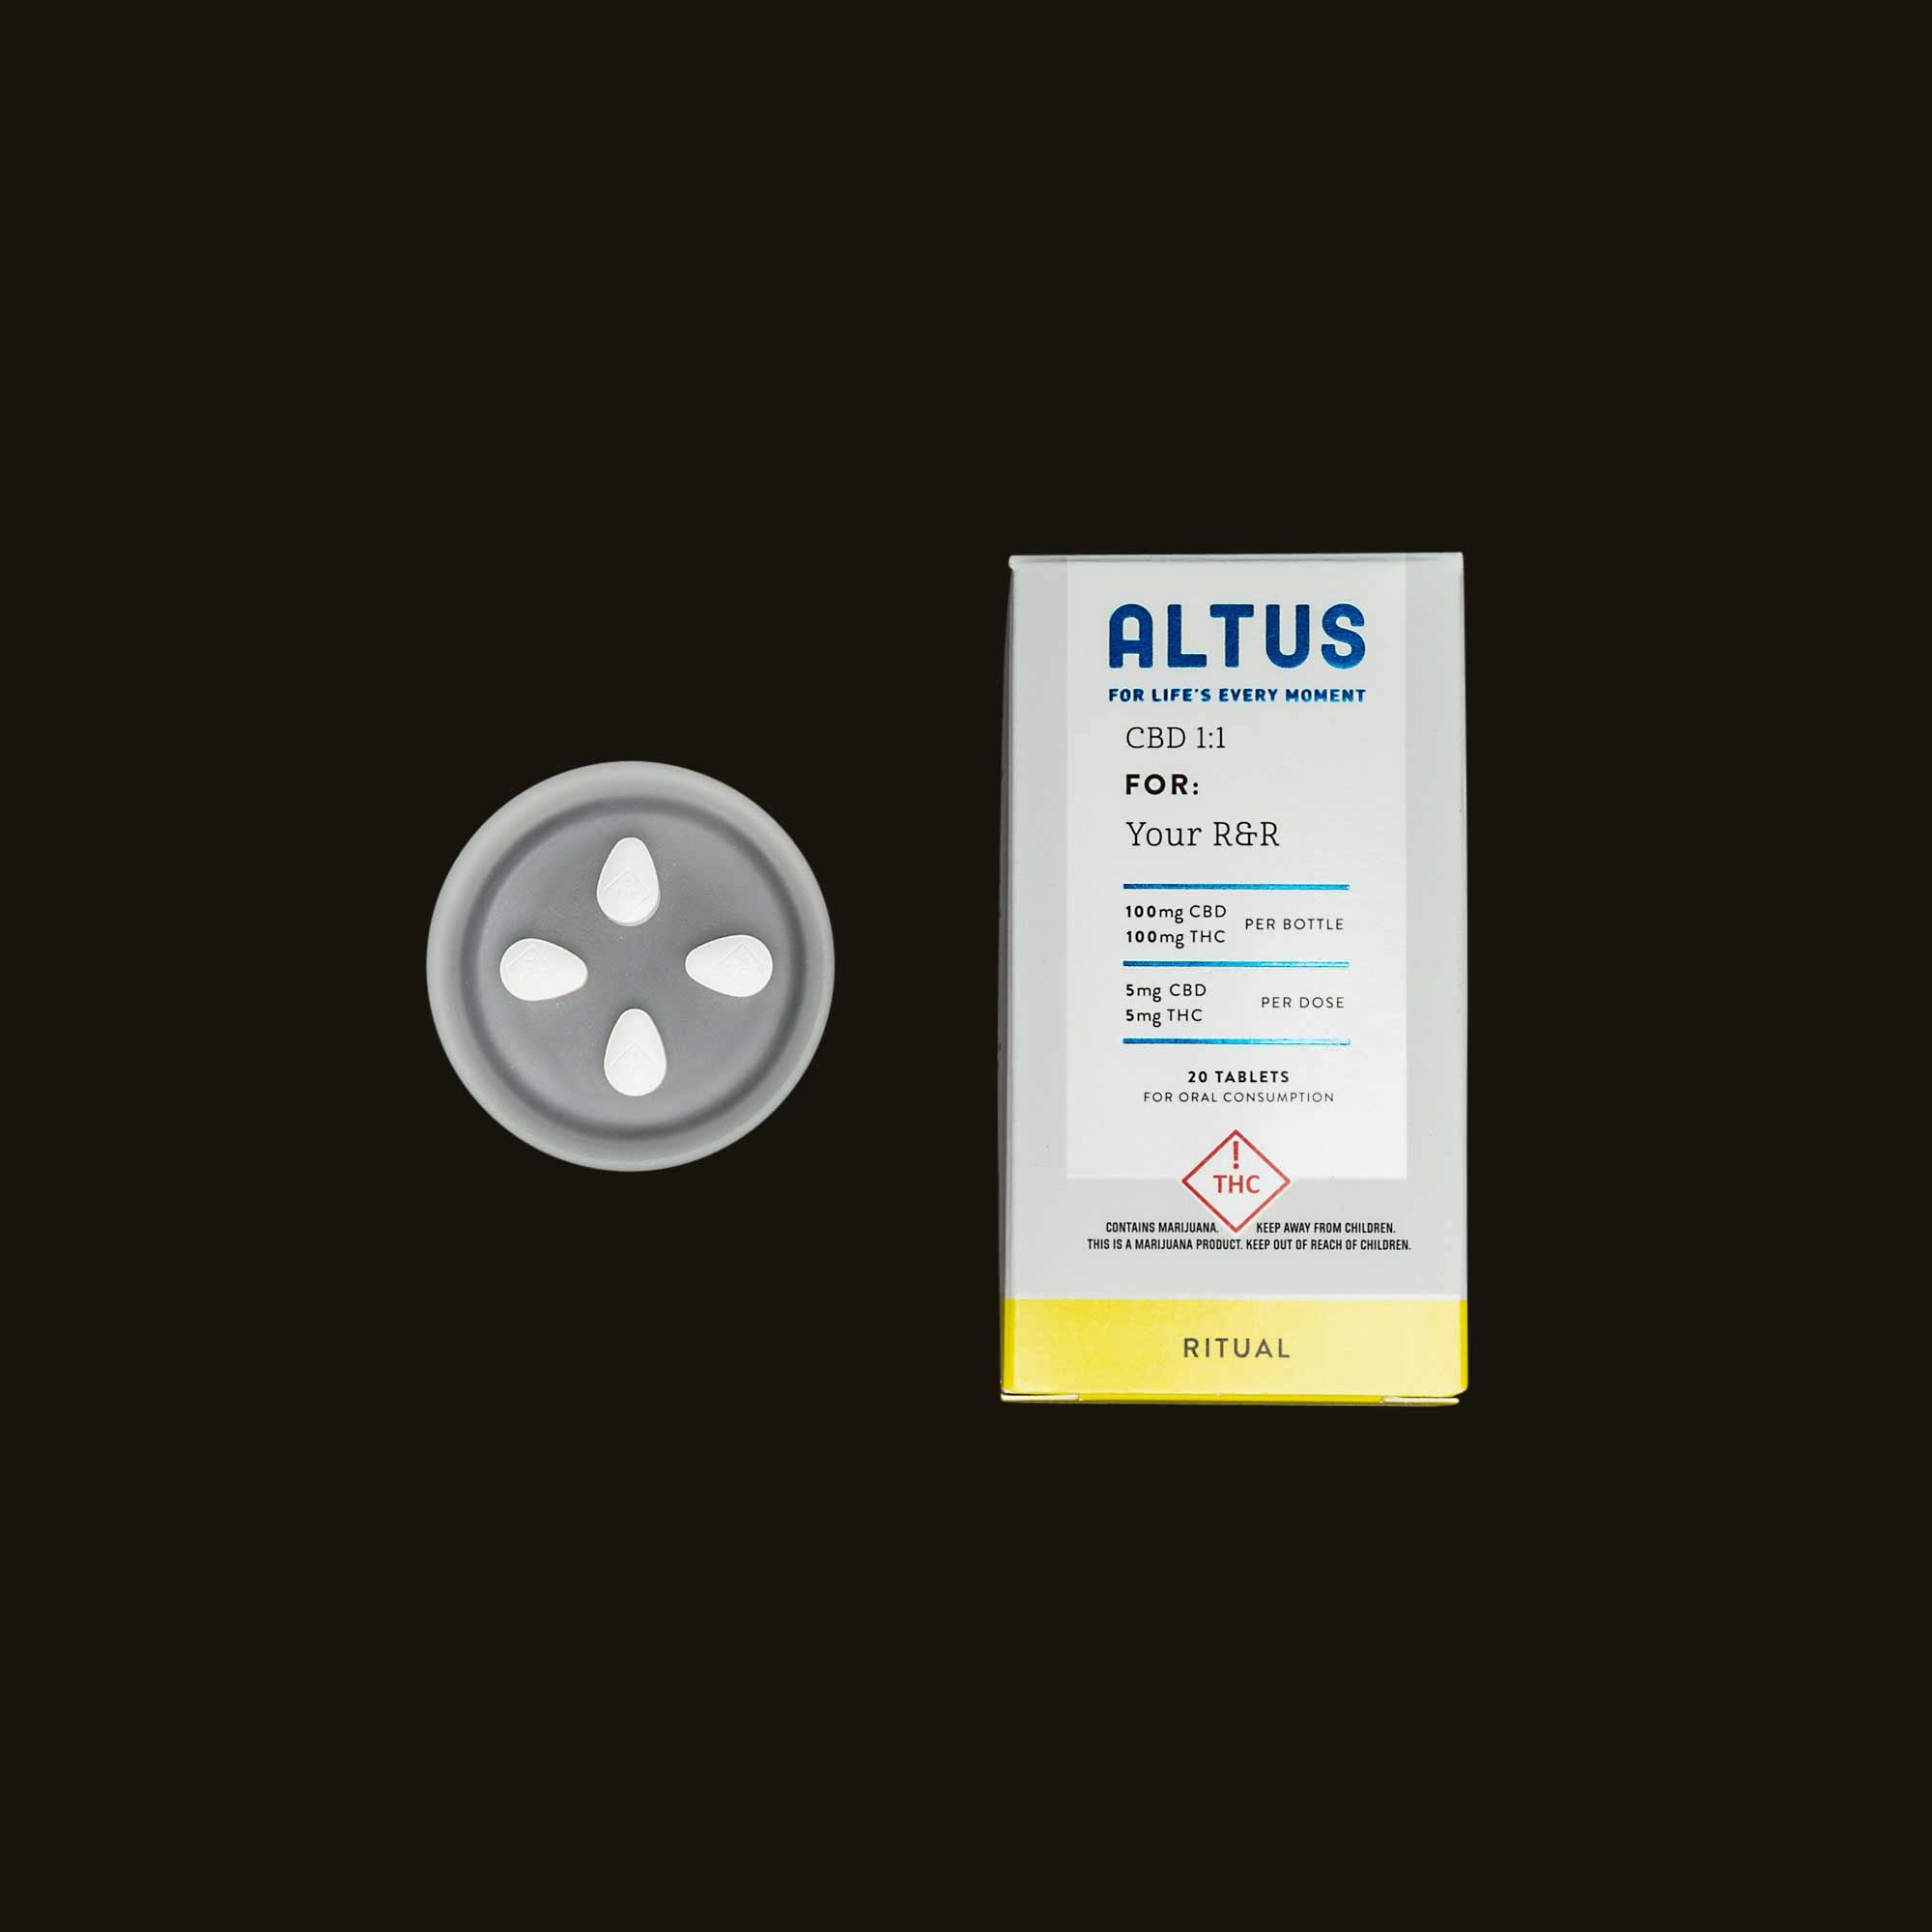 Altus Made Ritual 1:1 CBD:THC Tablets